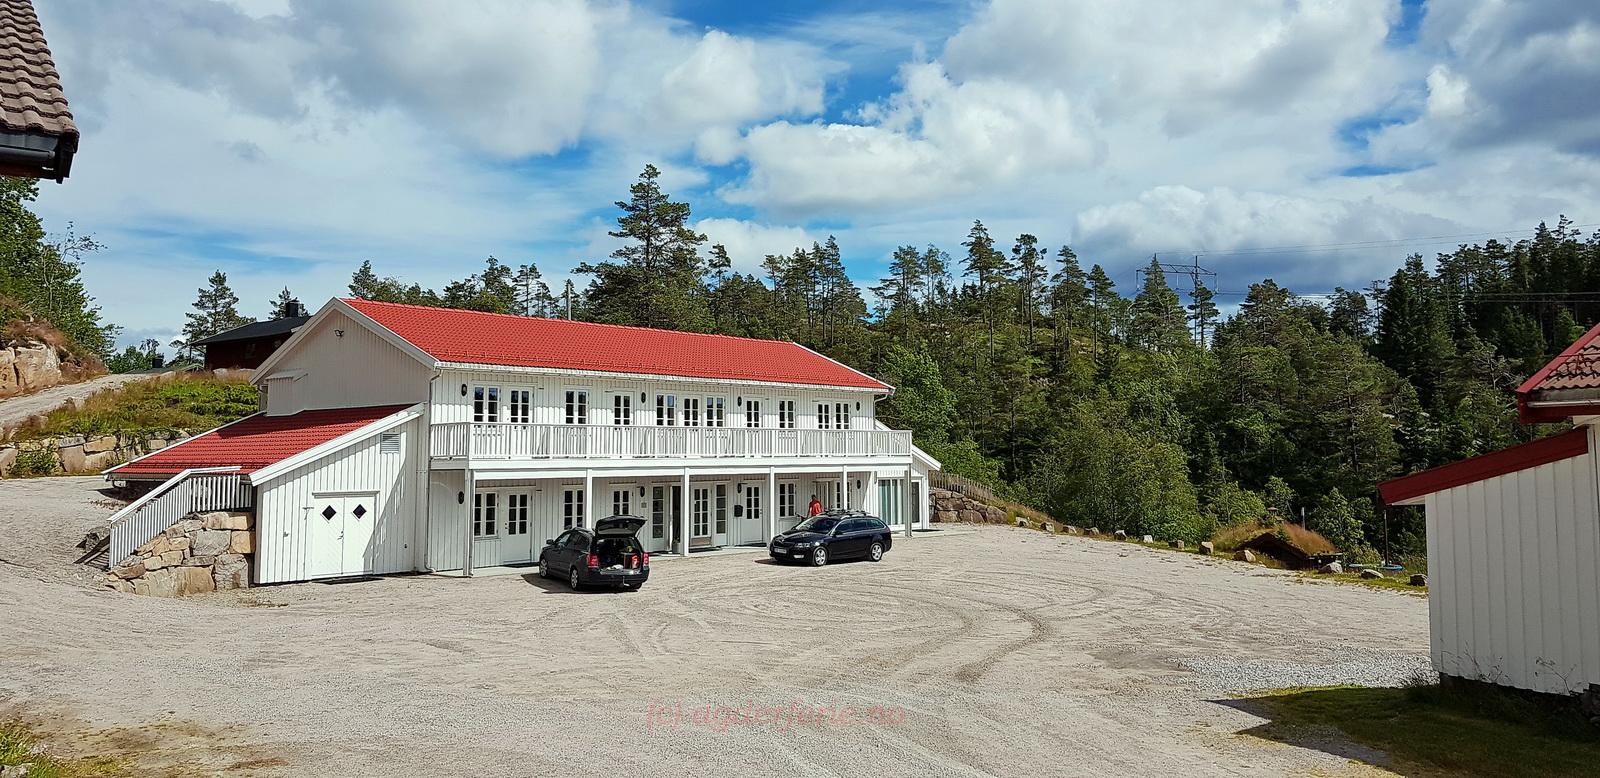 1102 Undeland gård, Kvås i Lyngdal